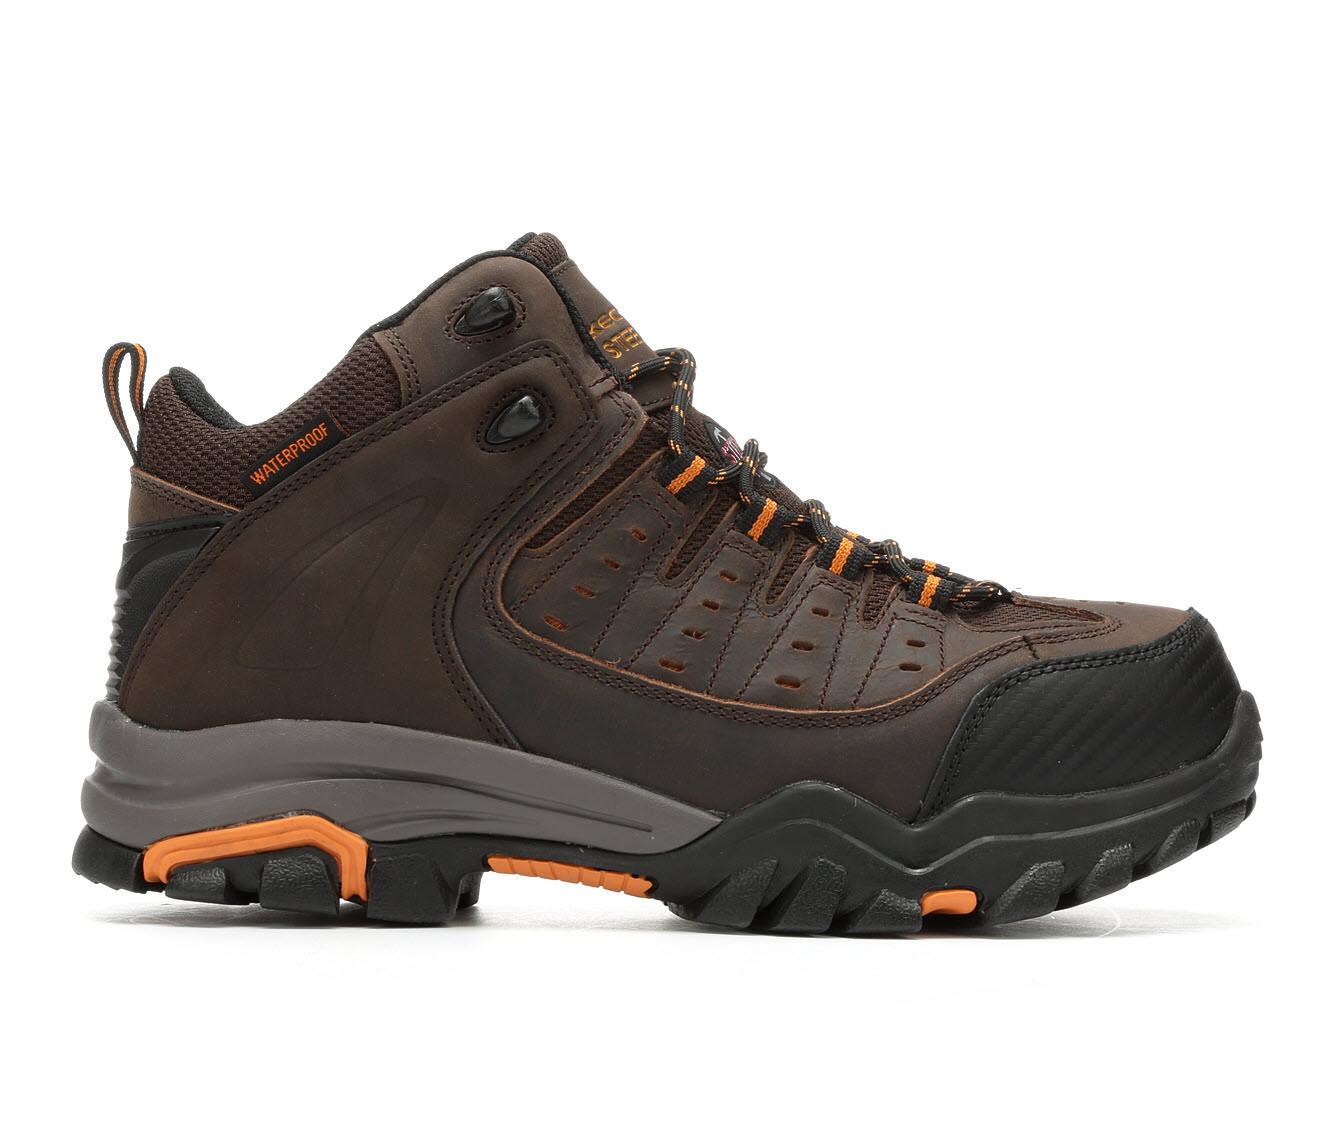 uk shoes_kd1564